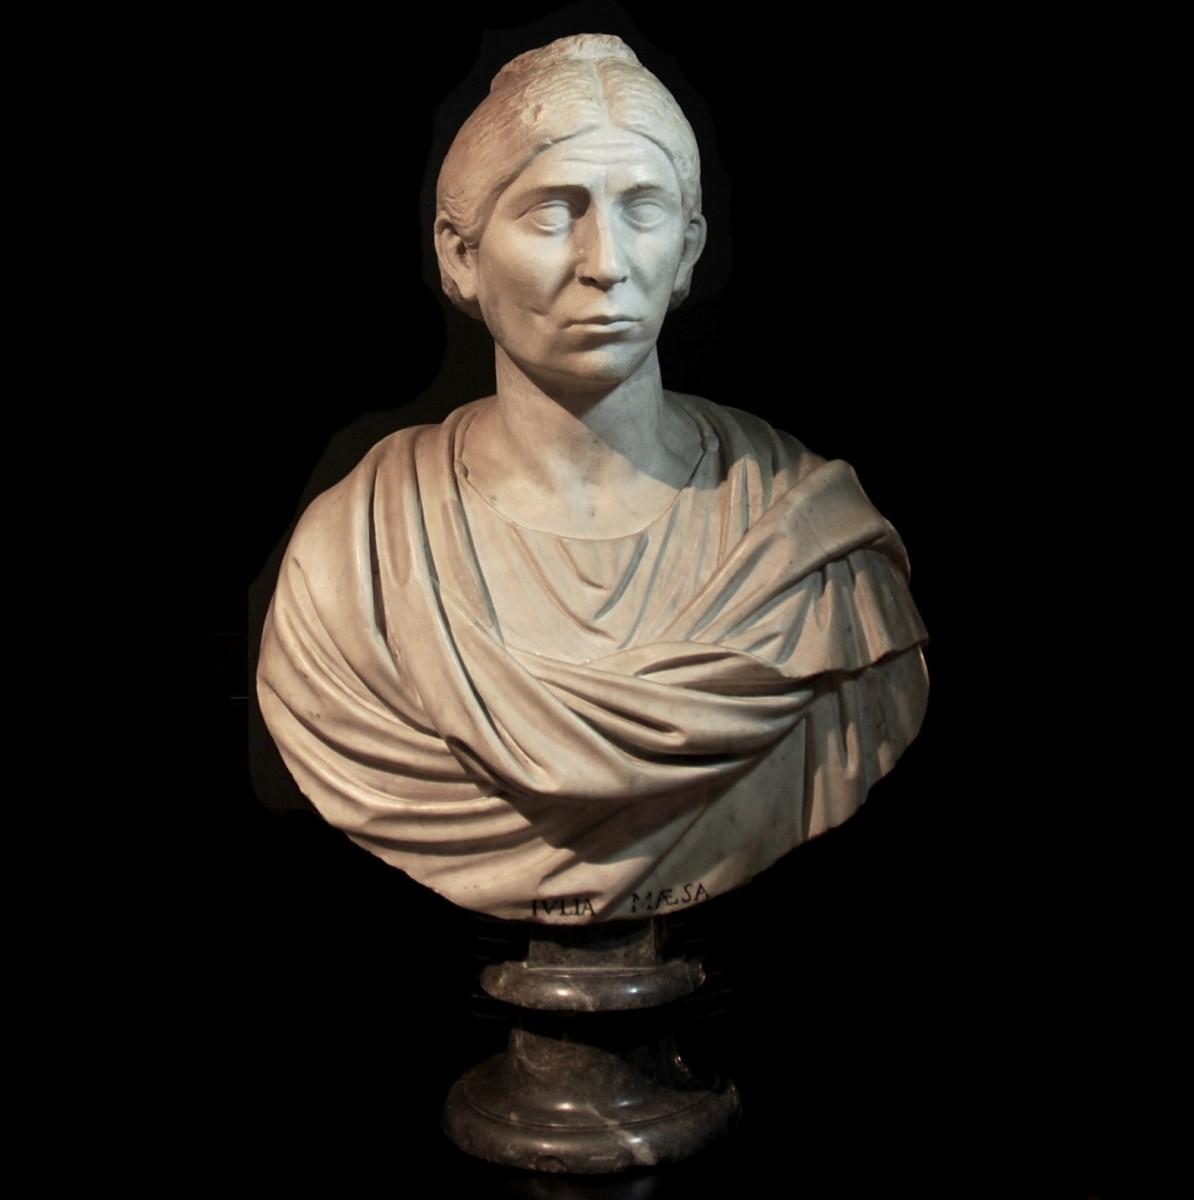 Roman marble bust of a matrona barracks emperor period